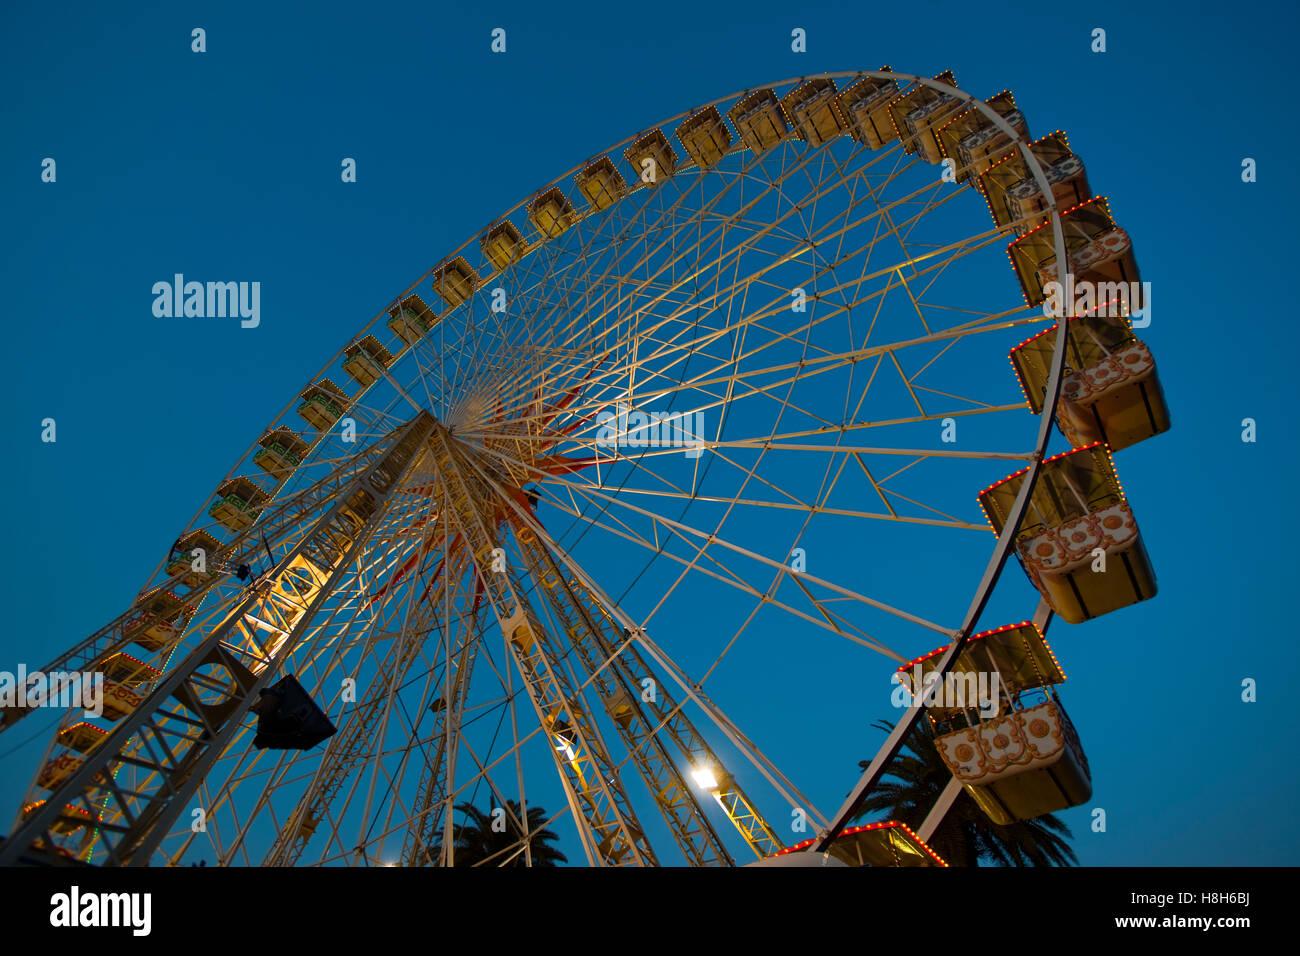 Frankreich, Cote d Azur, Nizza, Riesenrad im Park am Boulevard Jean Jaures zu Karneval - Stock Image